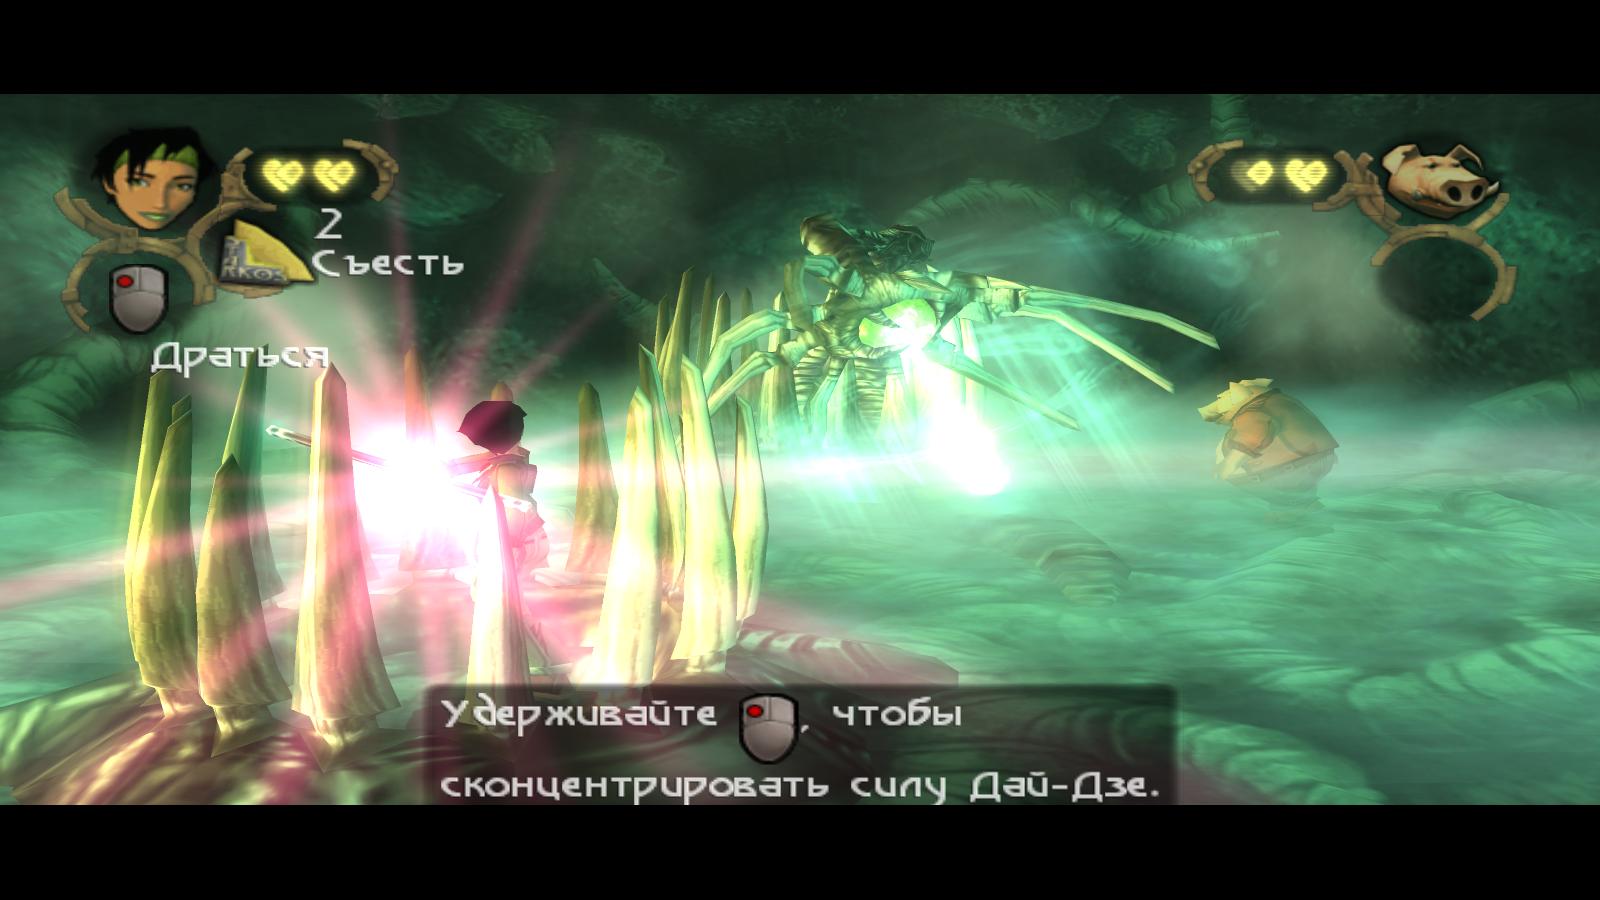 За гранью добра и зла / Beyond Good & Evil (2003/PC/Русский), RePack от R.G. Механики